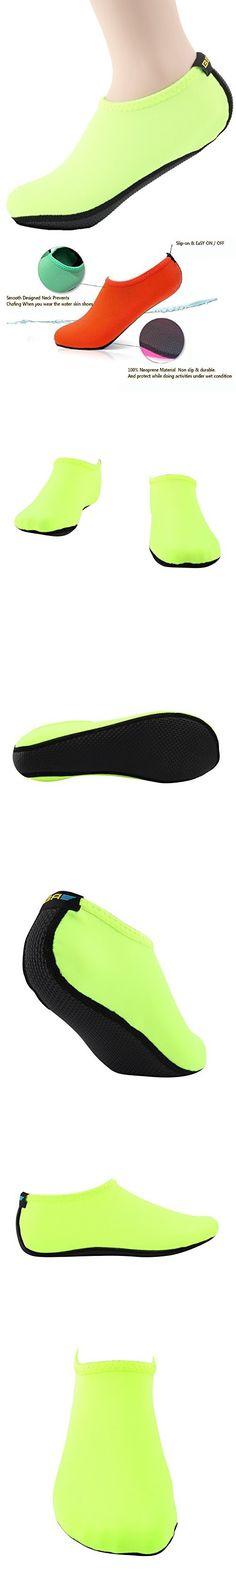 Wowfoot Water Shoes For Women Men's Aquatic Socks Flexible Fitness Pool (3. L(W:8-9, M:7-8), Green)